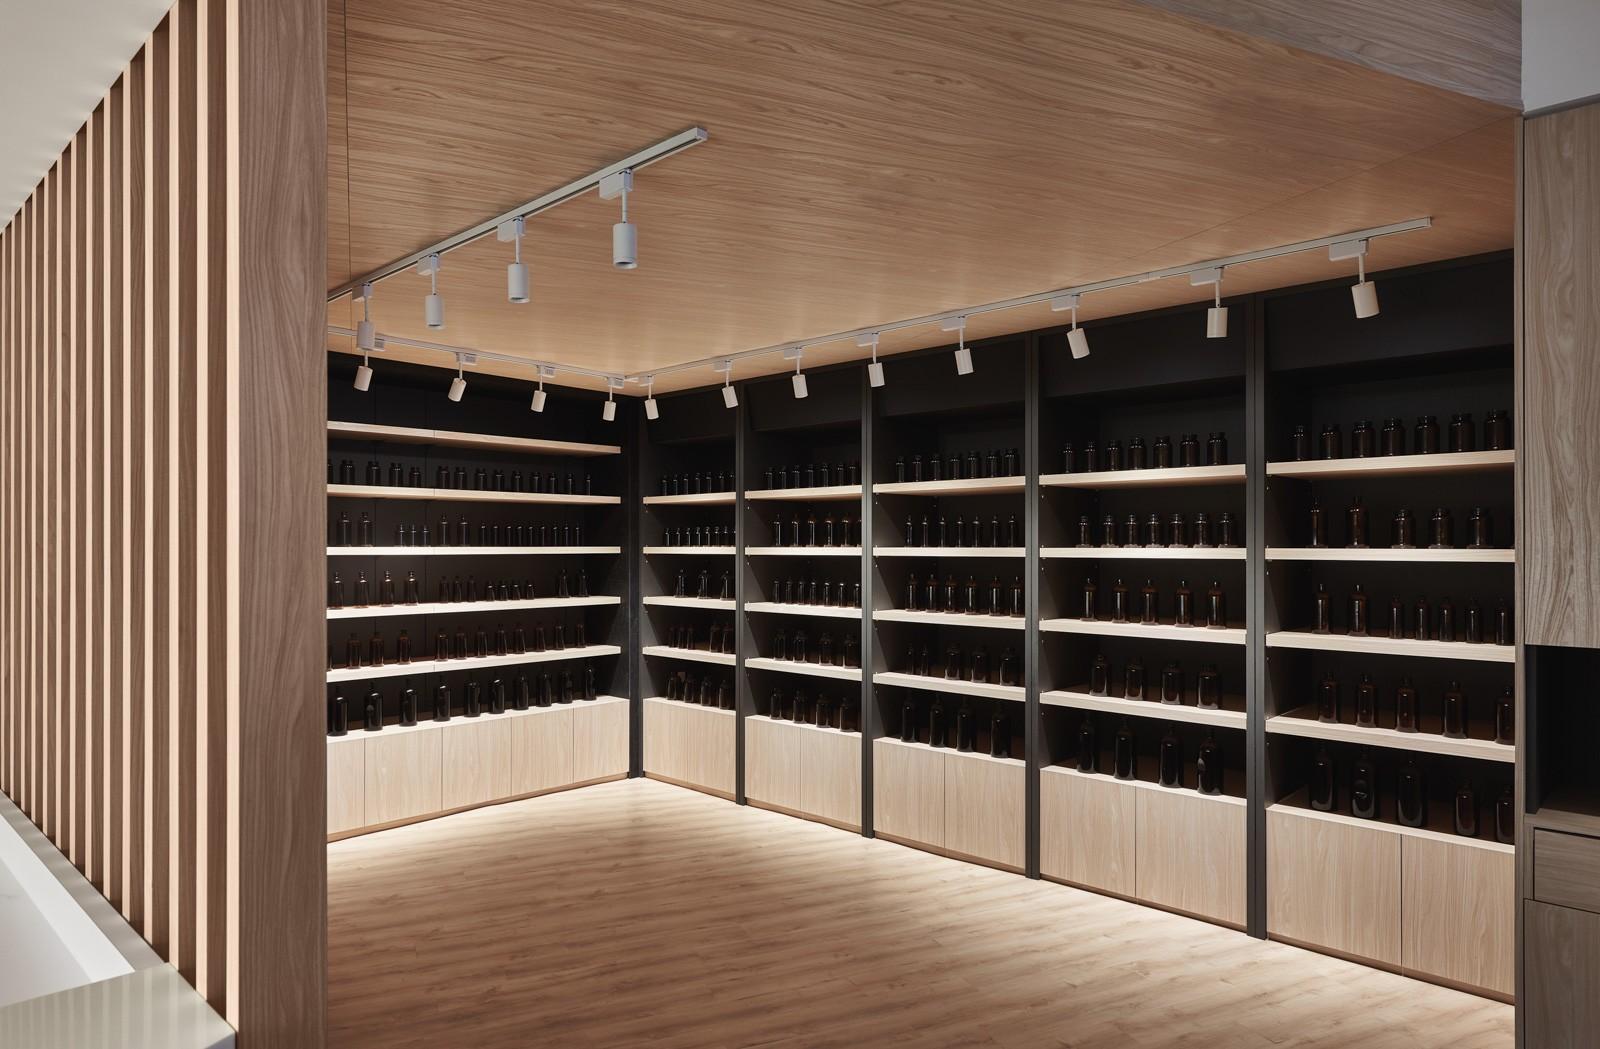 Wood Pharmacy Casework Concept